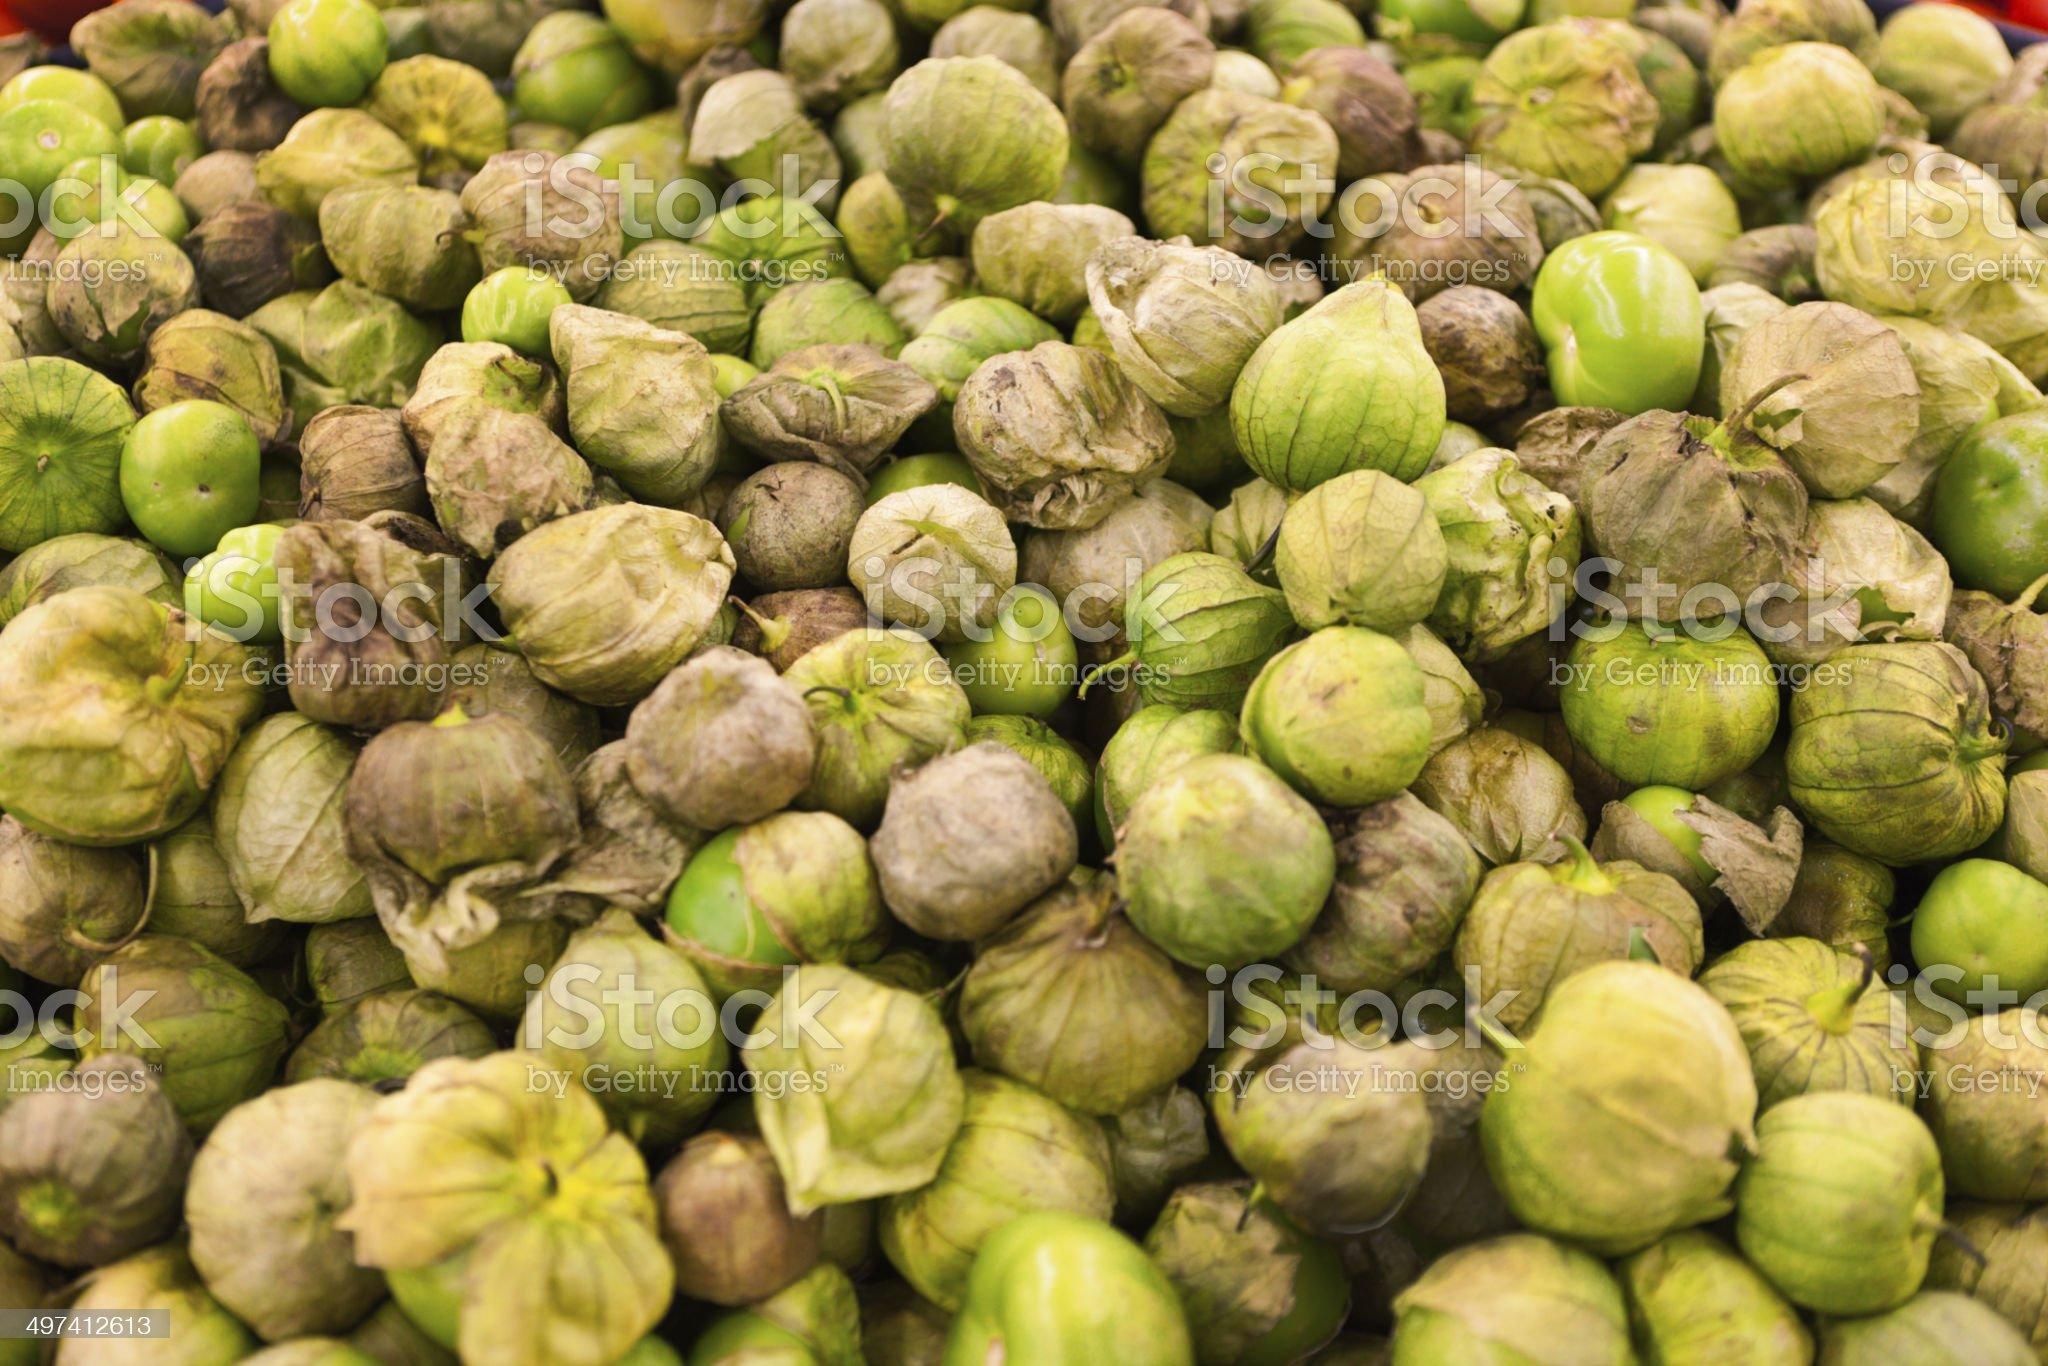 Tomatillos in Market Display royalty-free stock photo